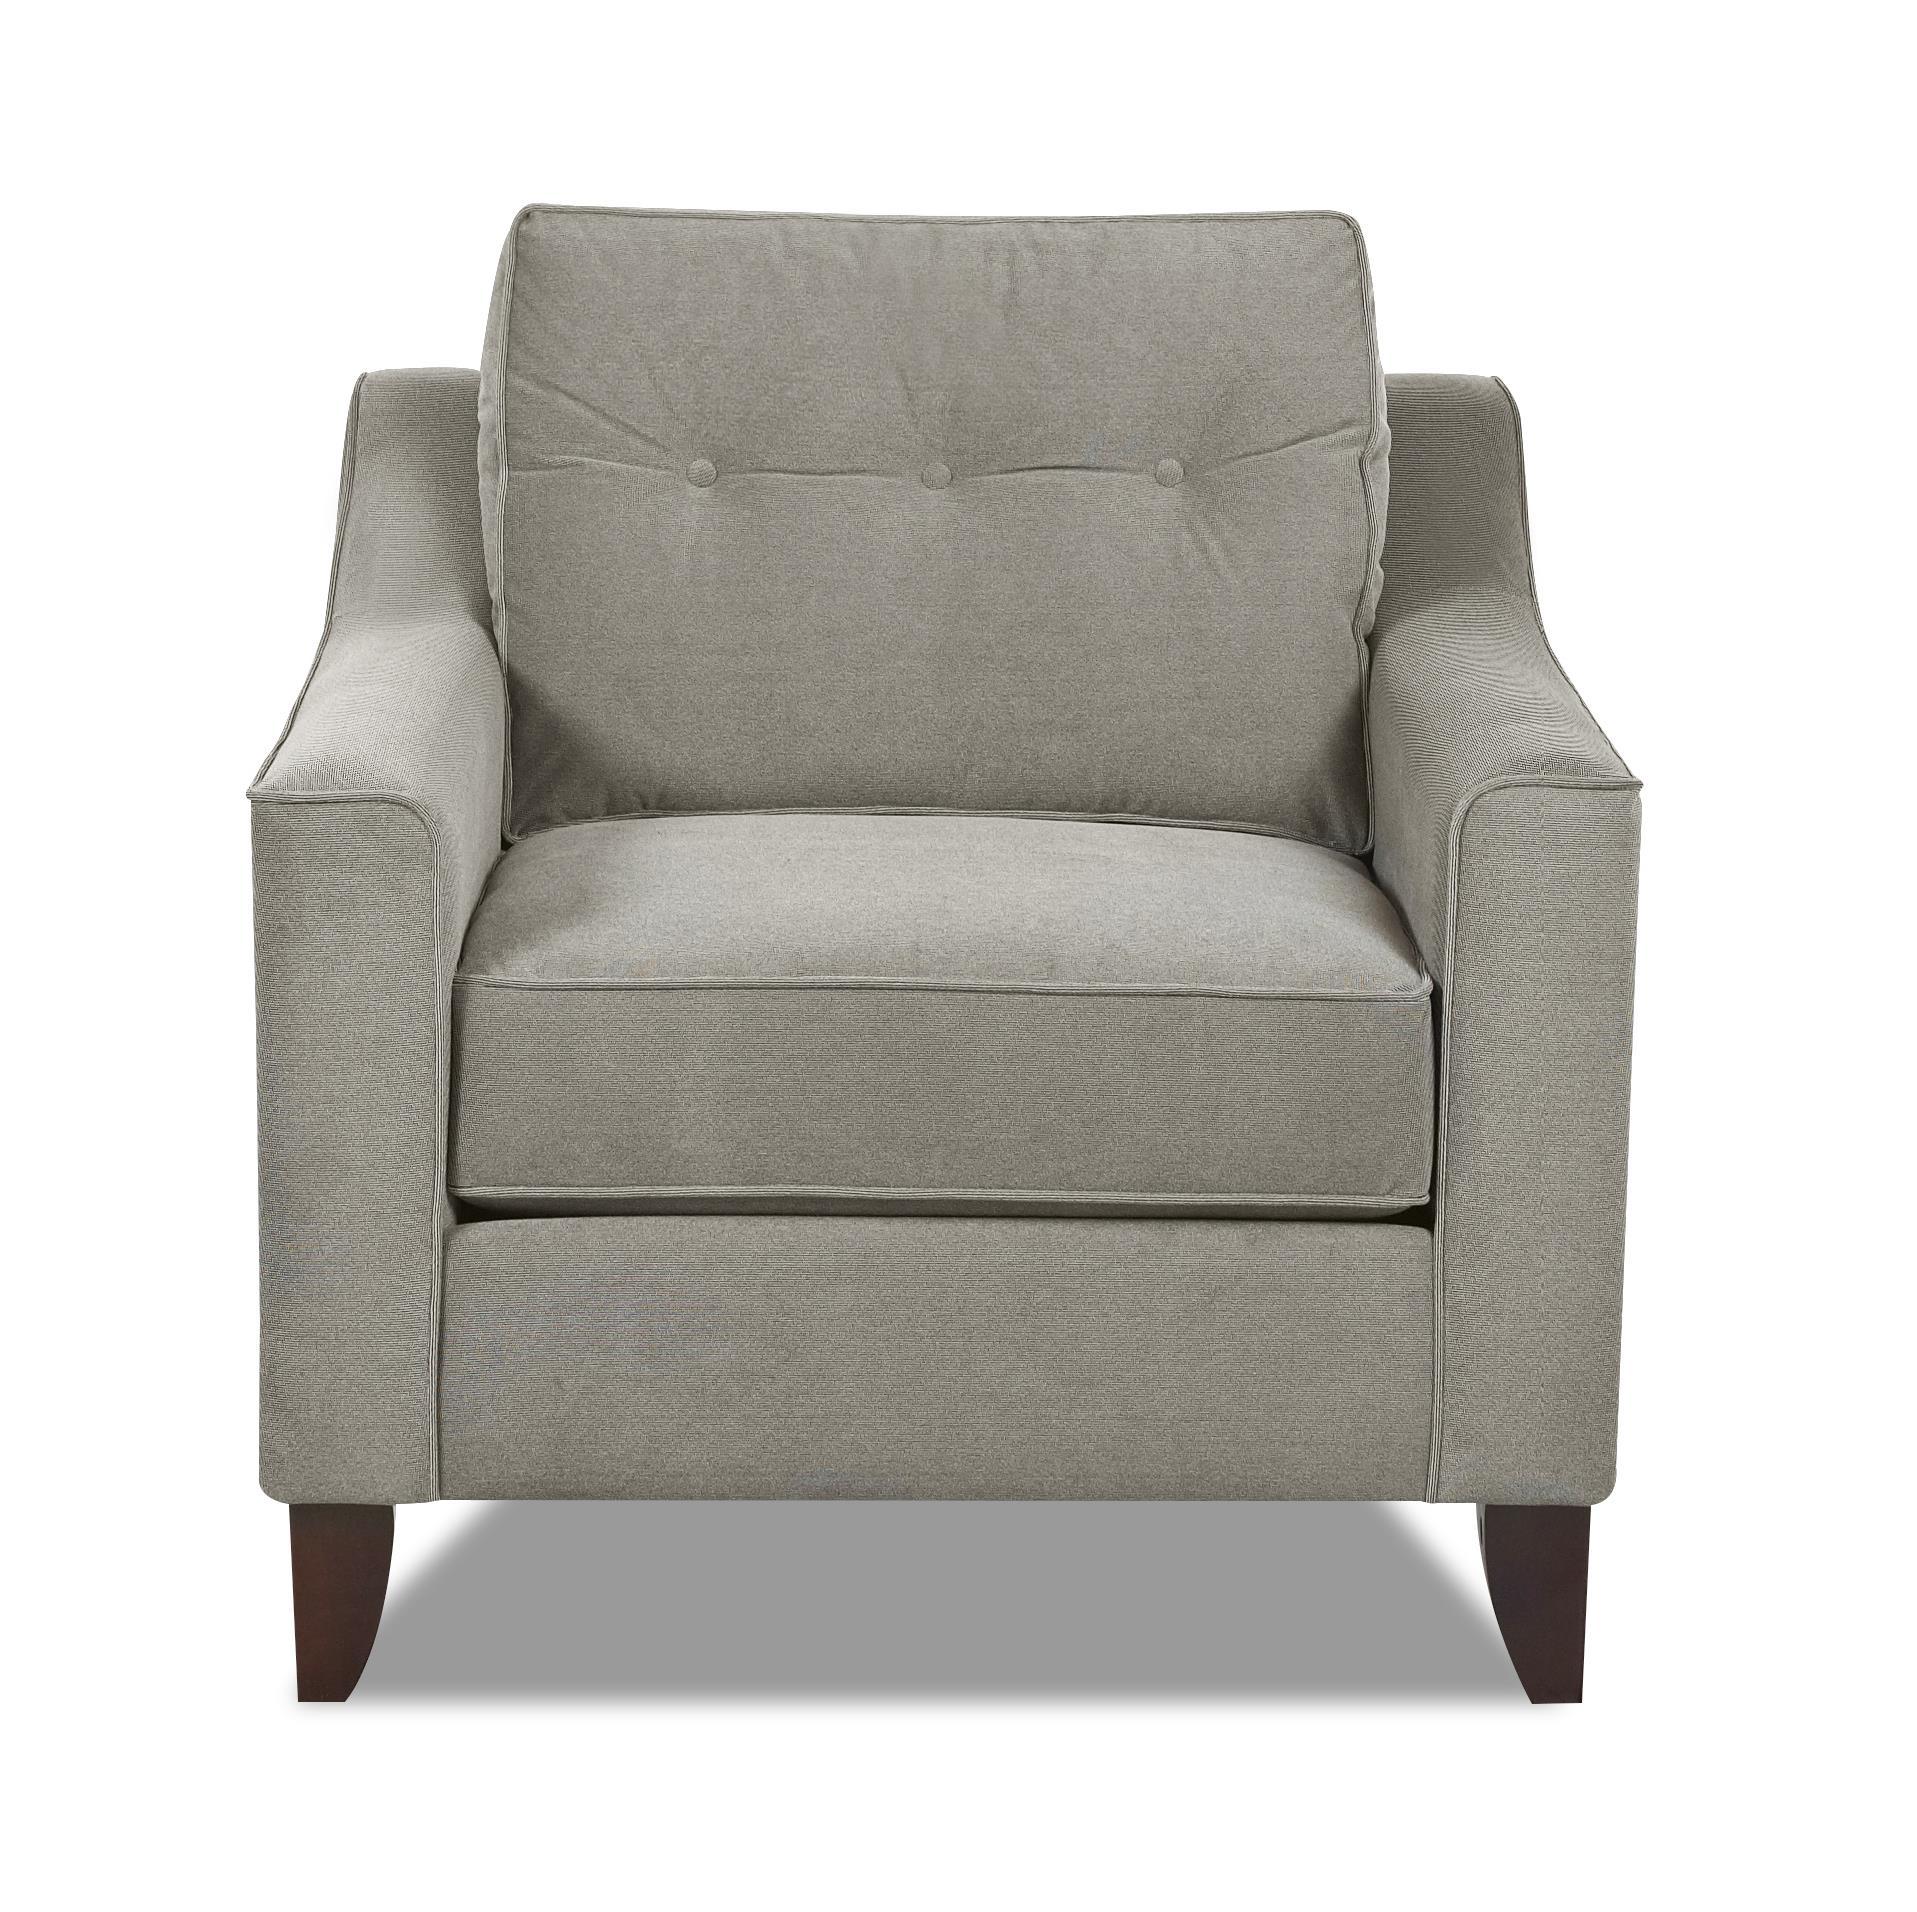 Klaussner Audrina Chair - Item Number: K31600 C-AttireBattleship